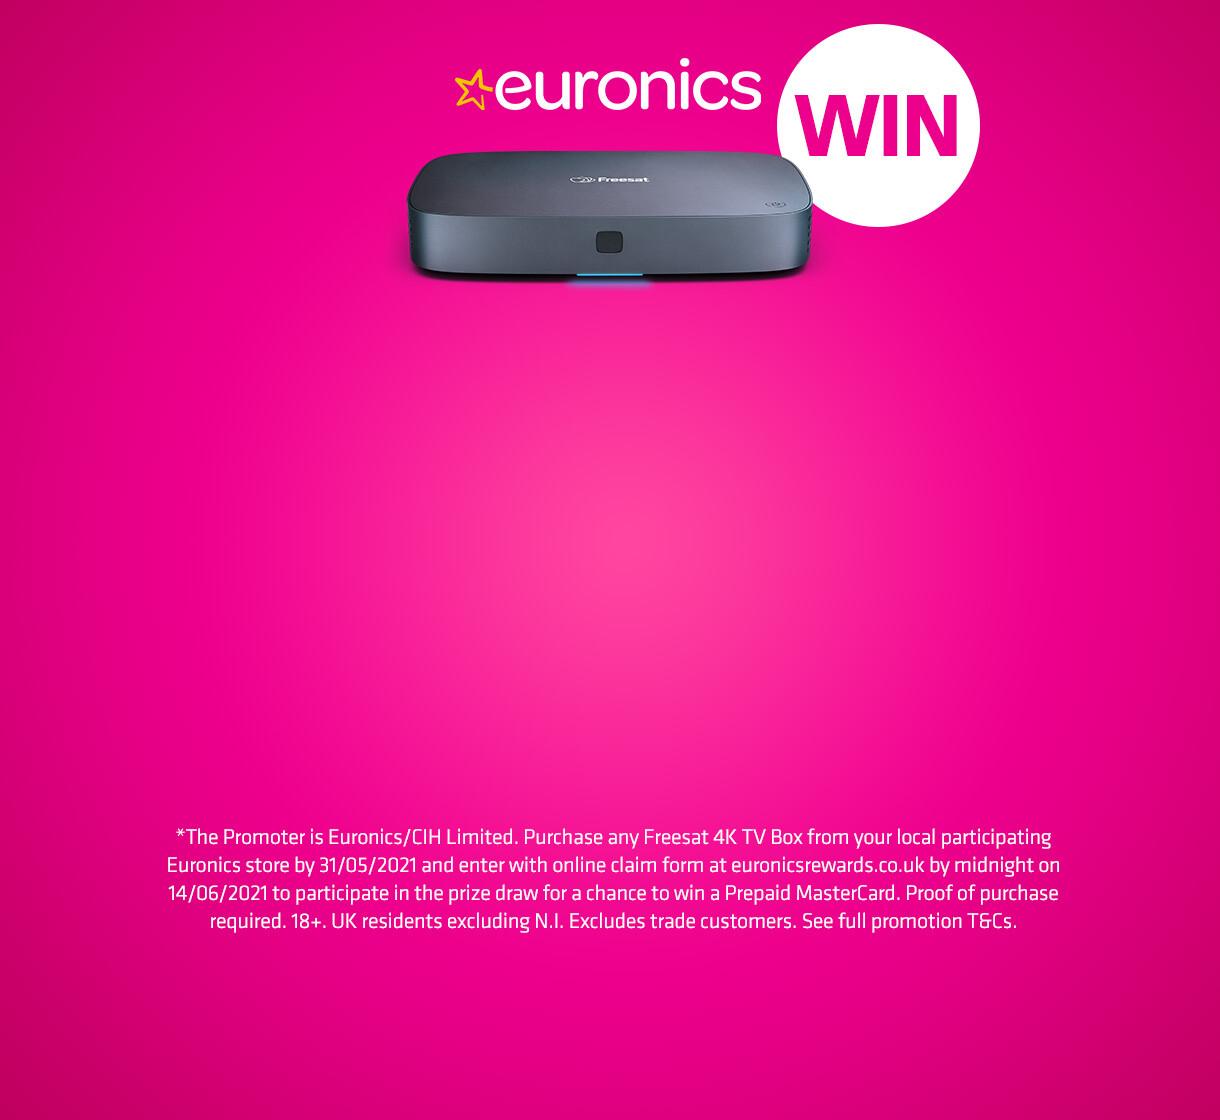 Euronics mobile